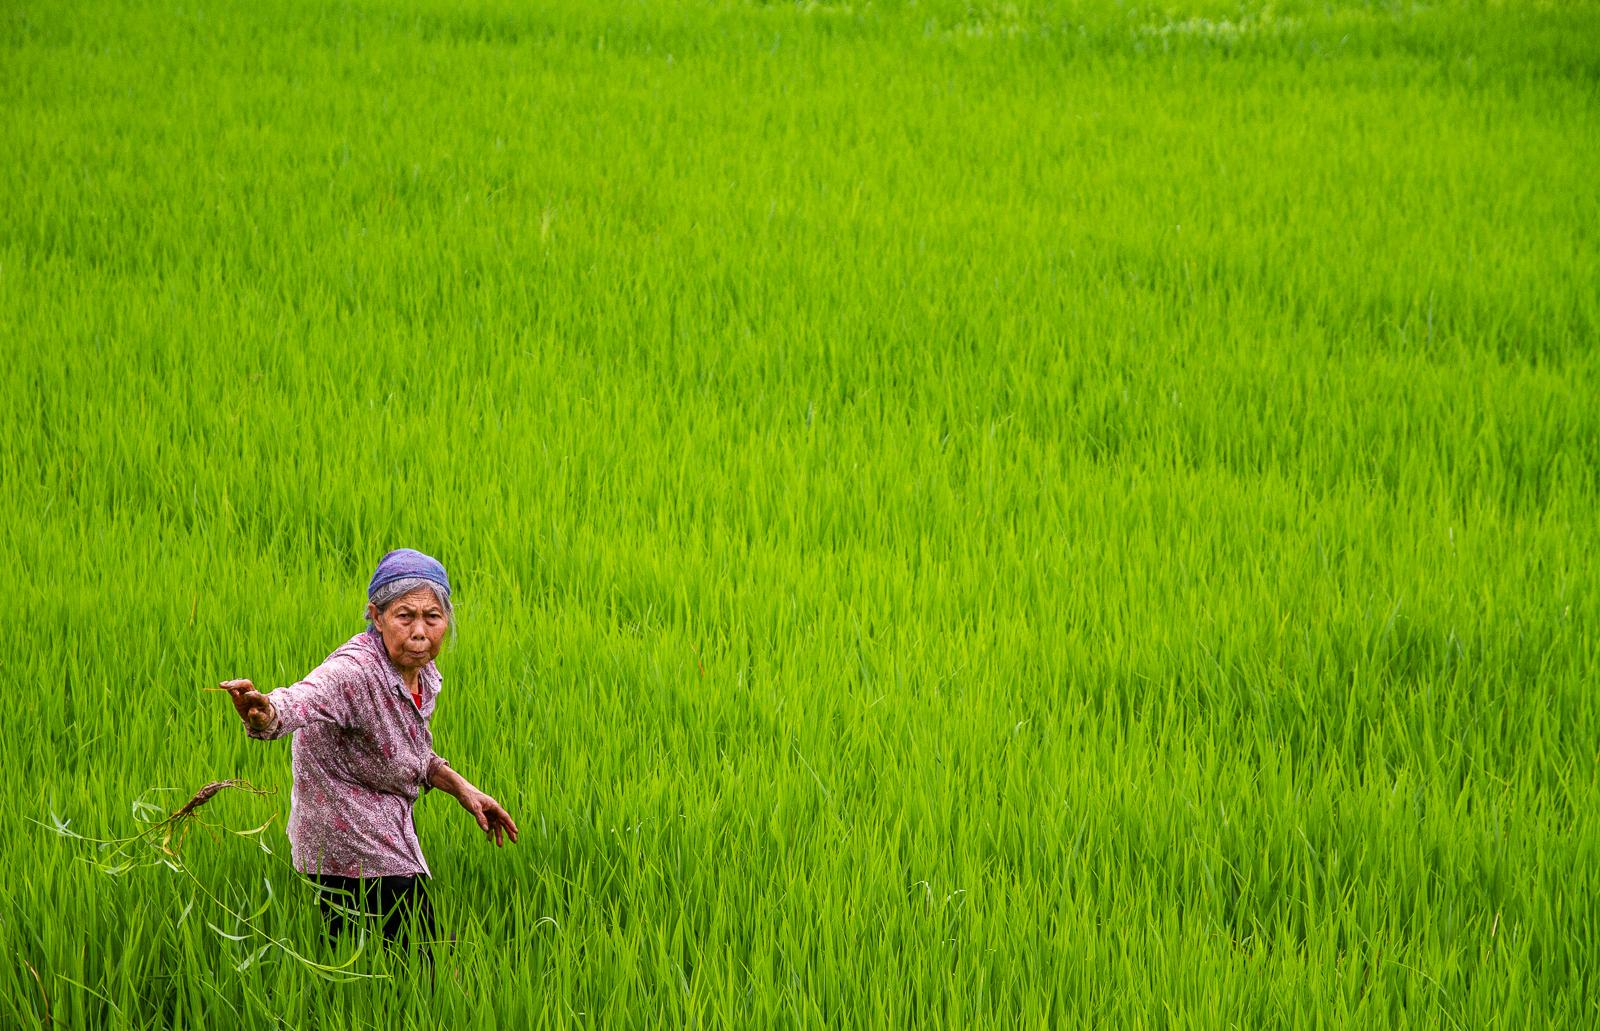 Michael-Harris-Weeding-the-Rice-Paddy-10